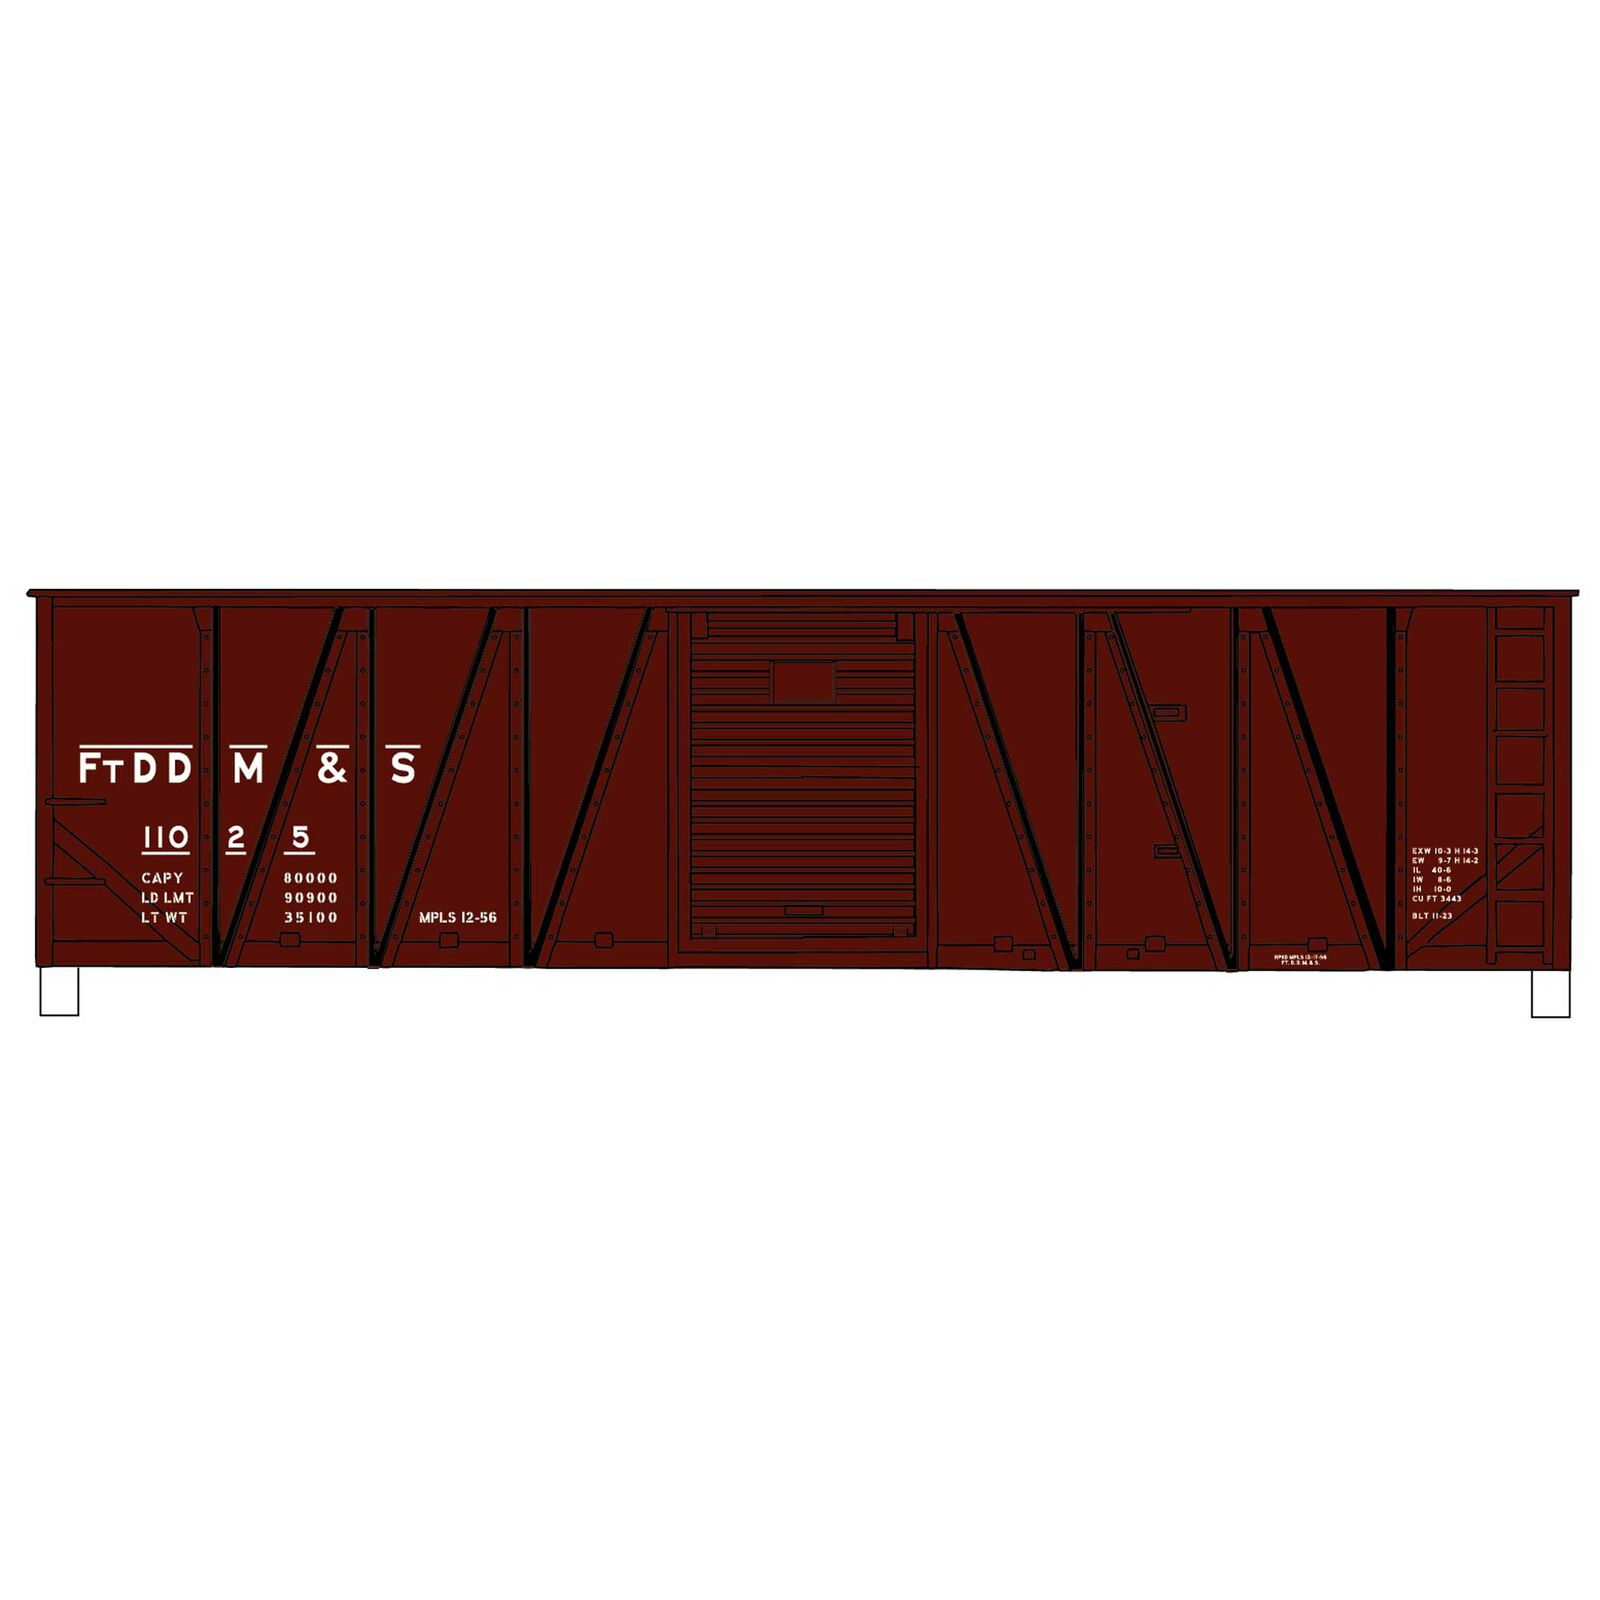 HO KIT 40' Wood Outside Braced Box FtDDM&S